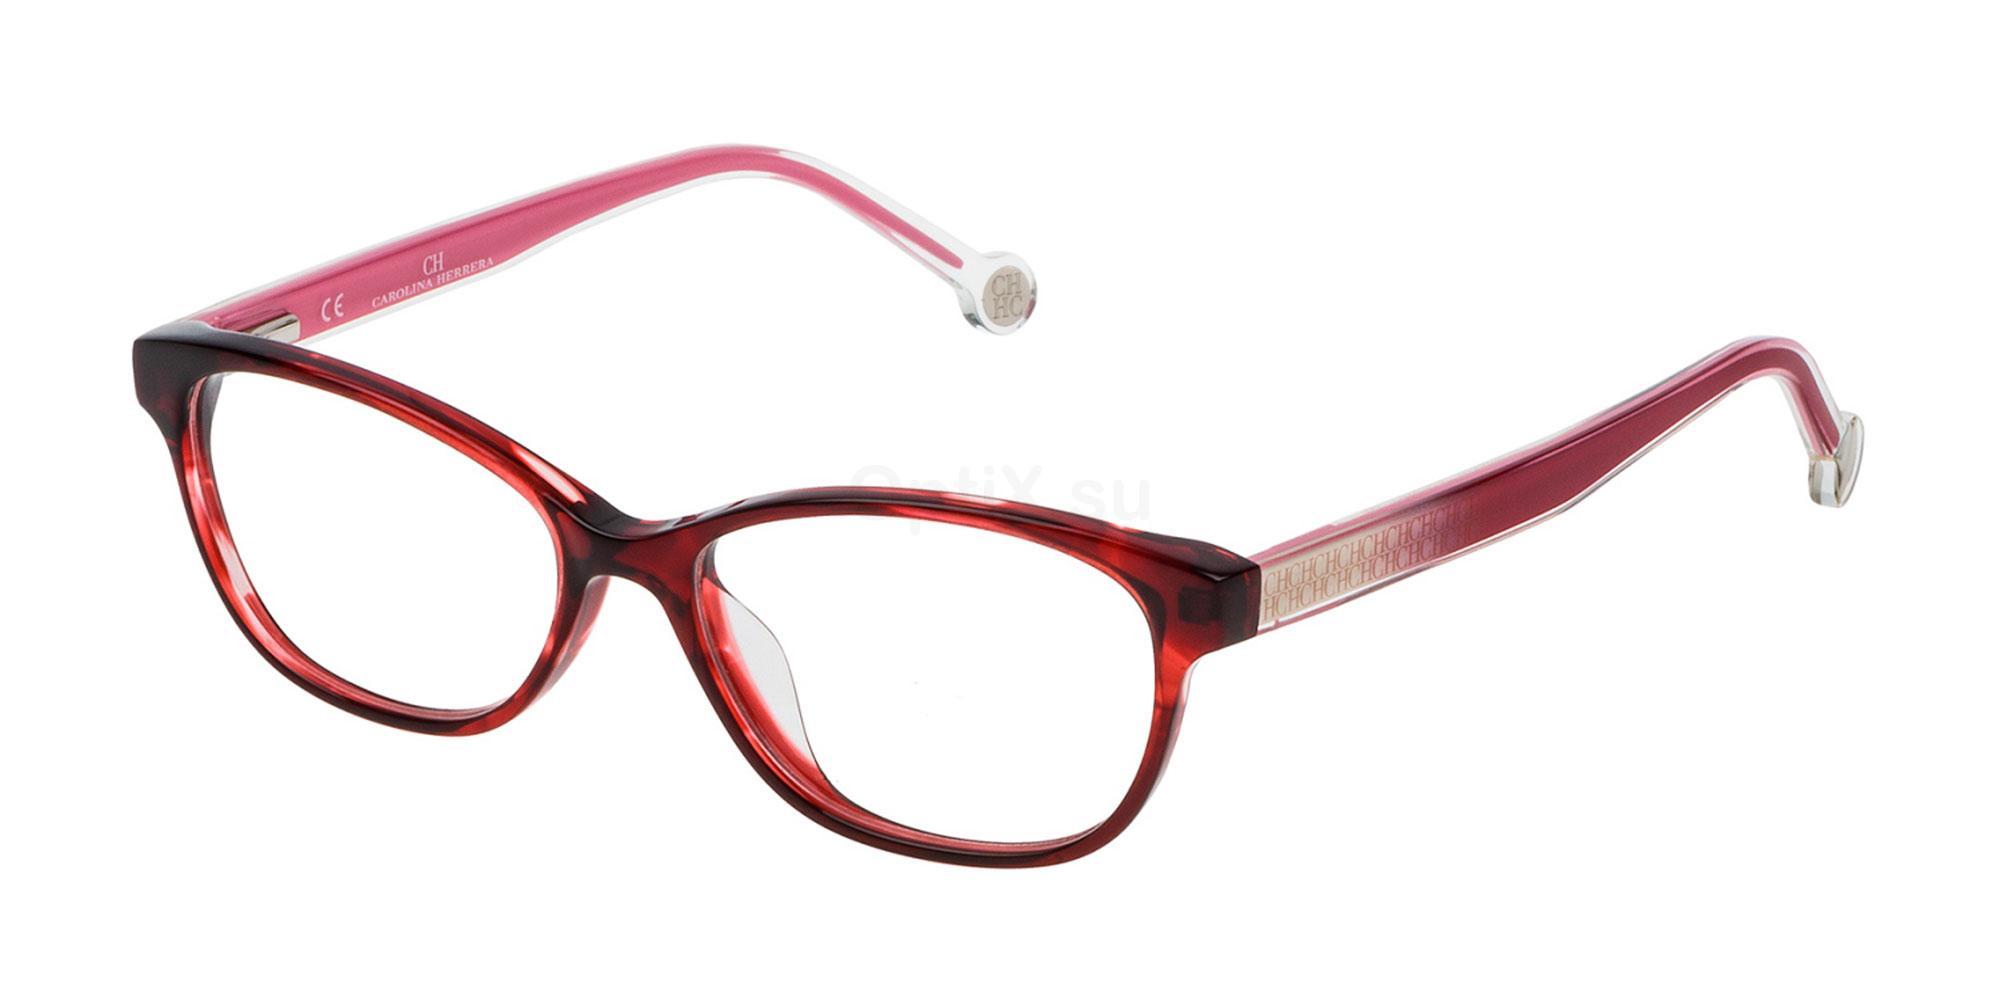 01GJ VHE726L Glasses, CH Carolina Herrera